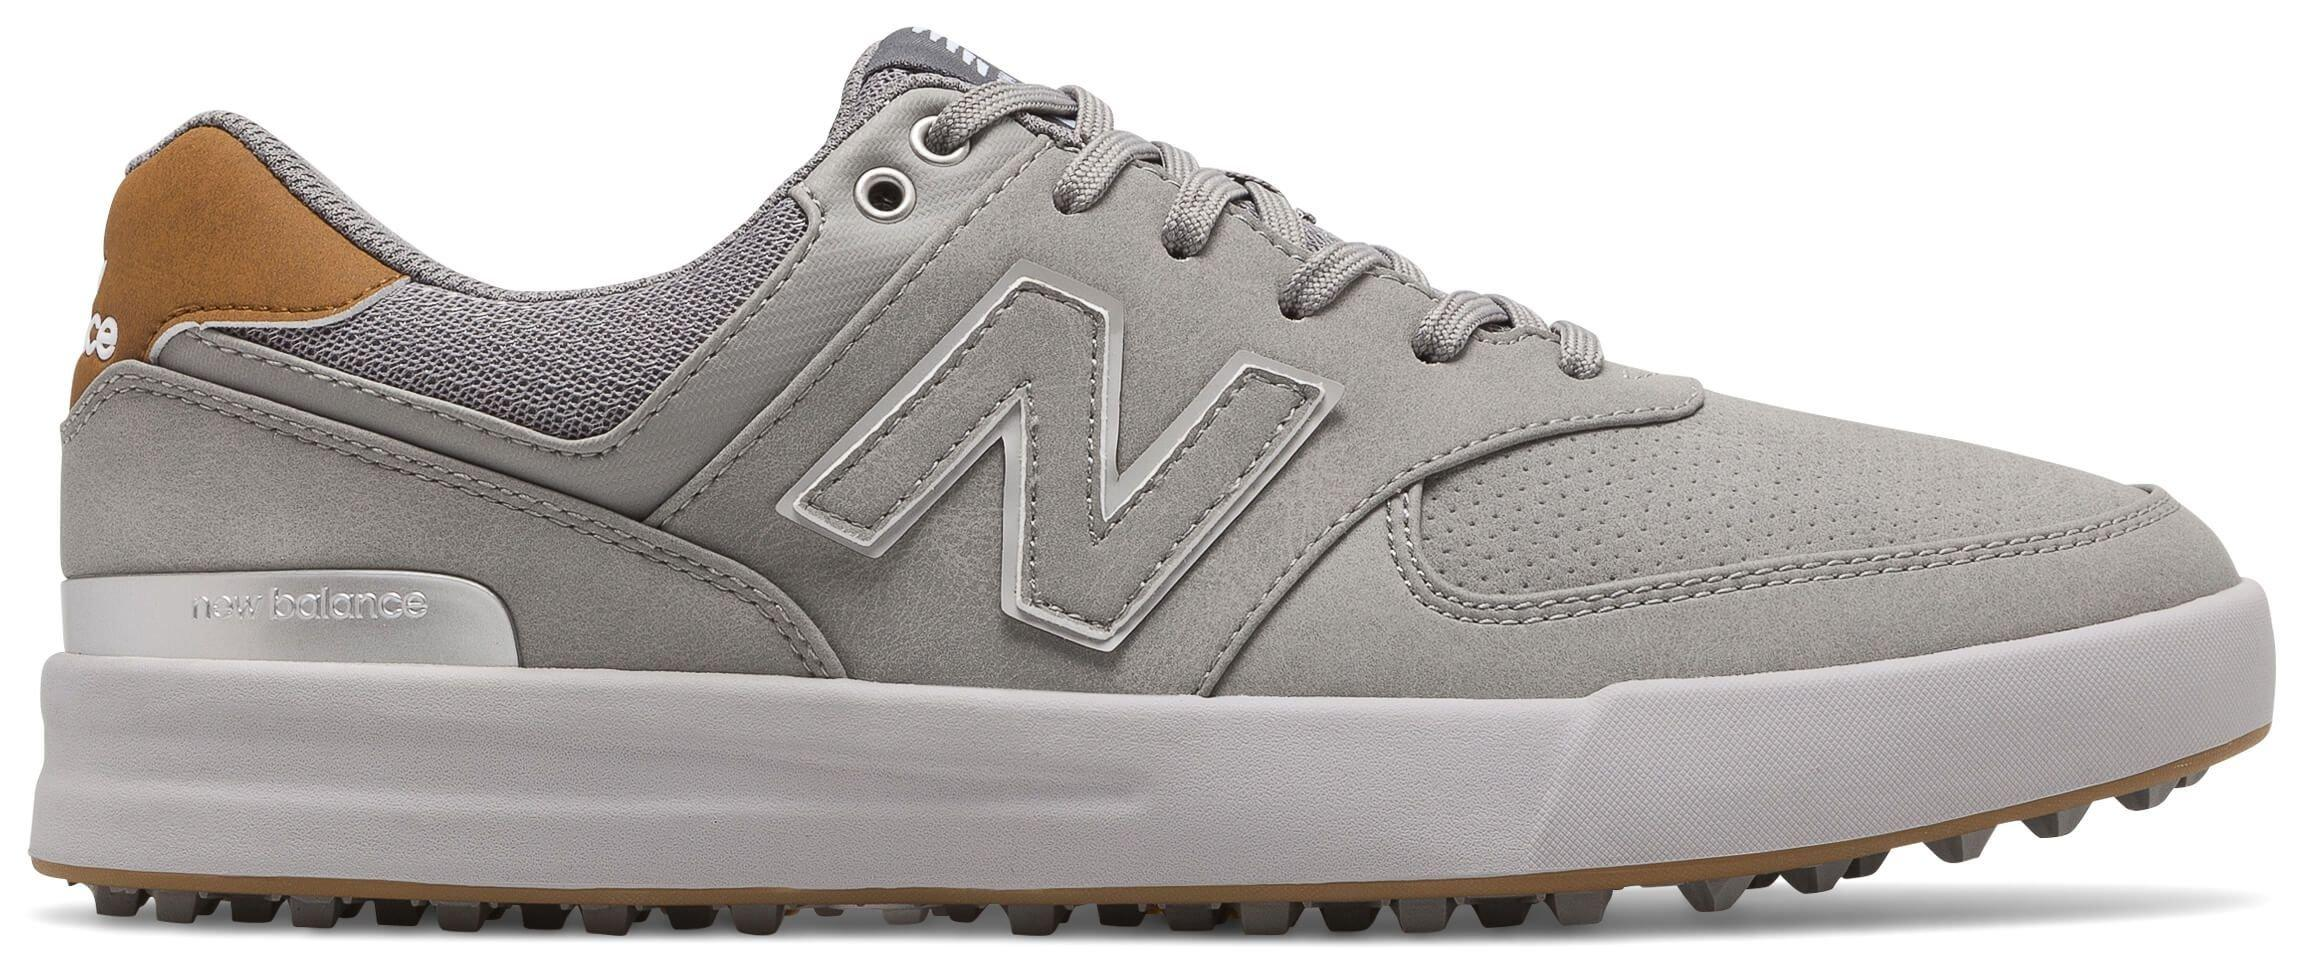 New Balance NB 574 Greens Golf Shoes